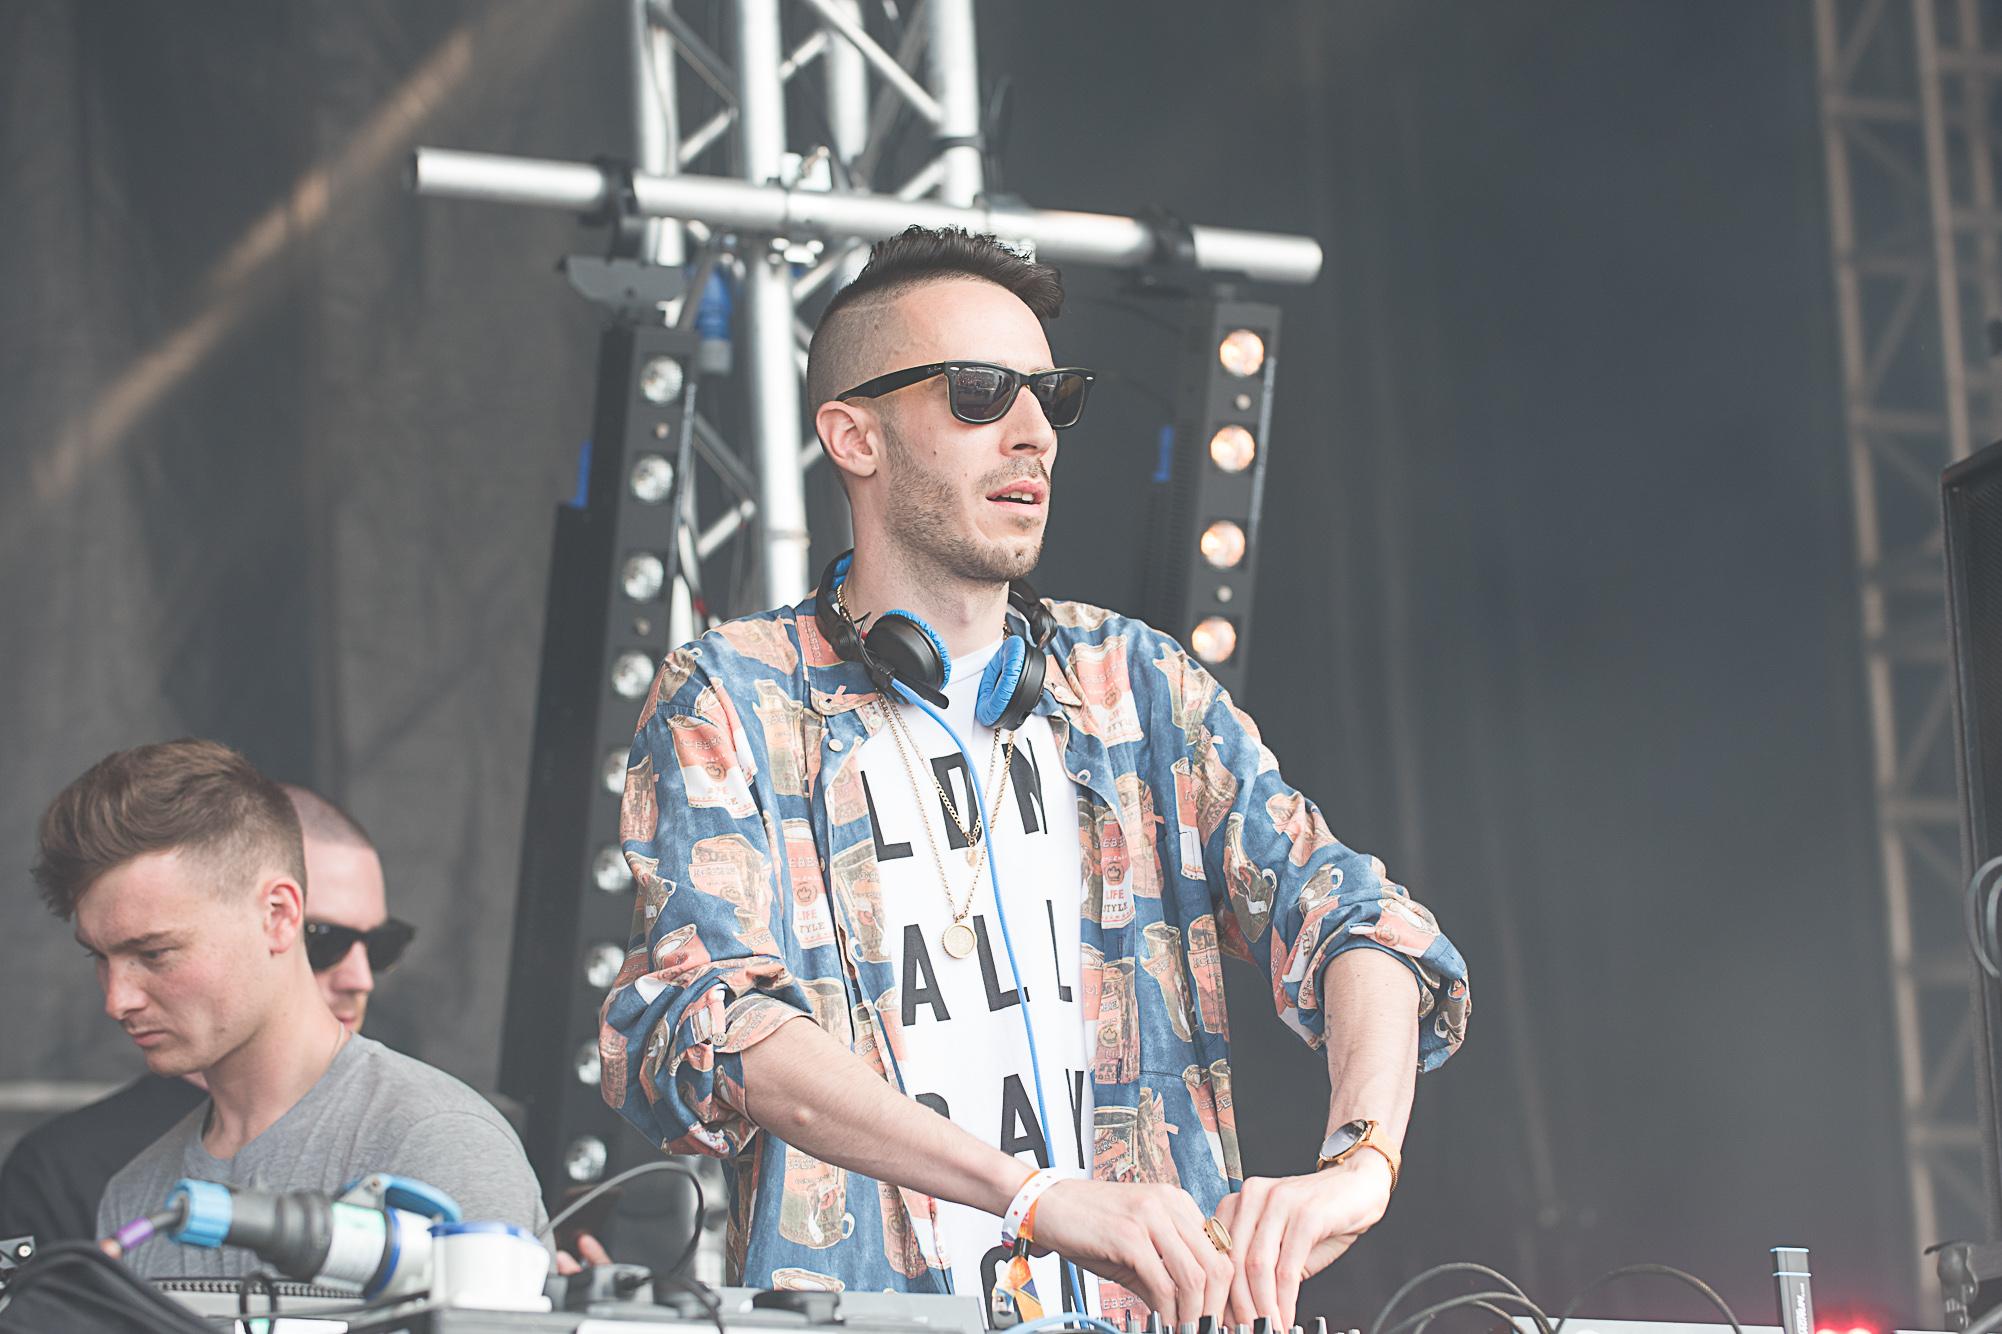 4034_DJs Swamp 81 Allstars_Rinse | BornBred_.JPG